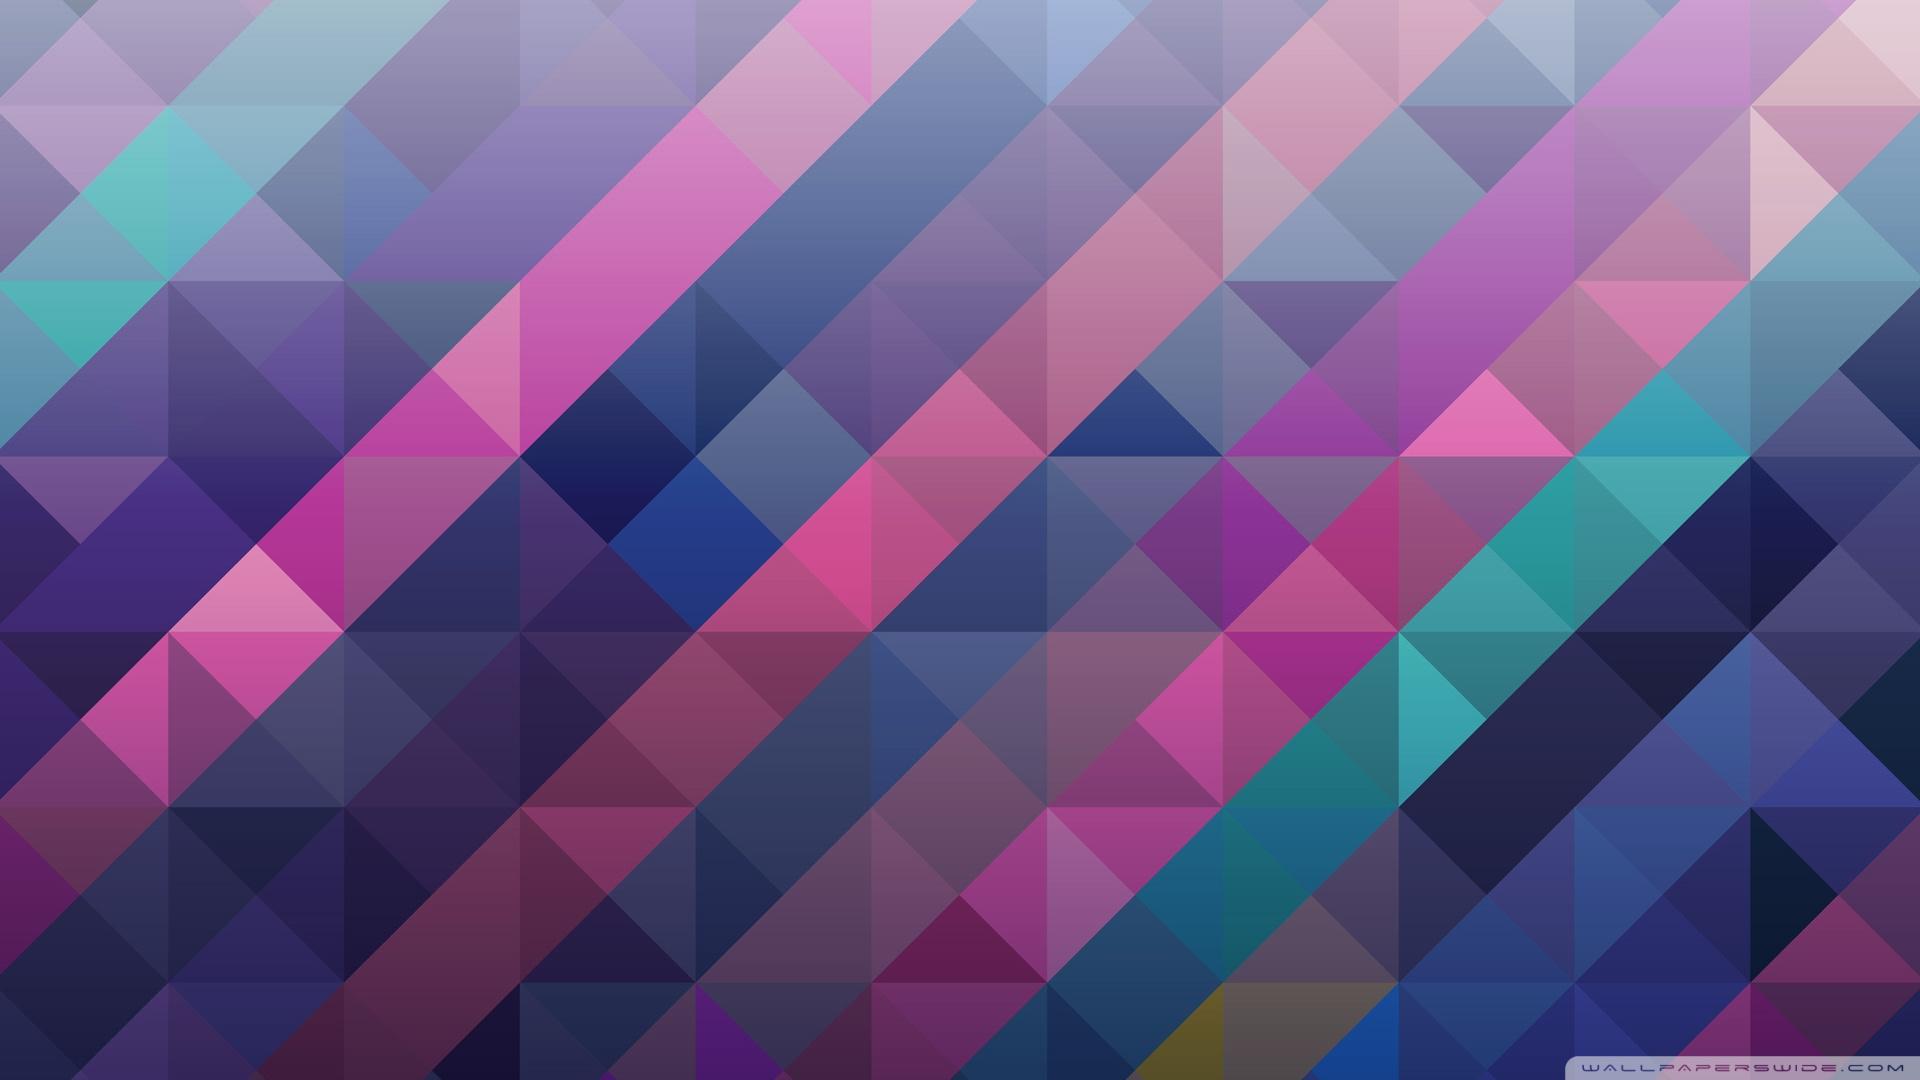 Wallpapers For Mac Hd: 182+ Best MAC Wallpapers: Apple MAC Full HD Wallpapers